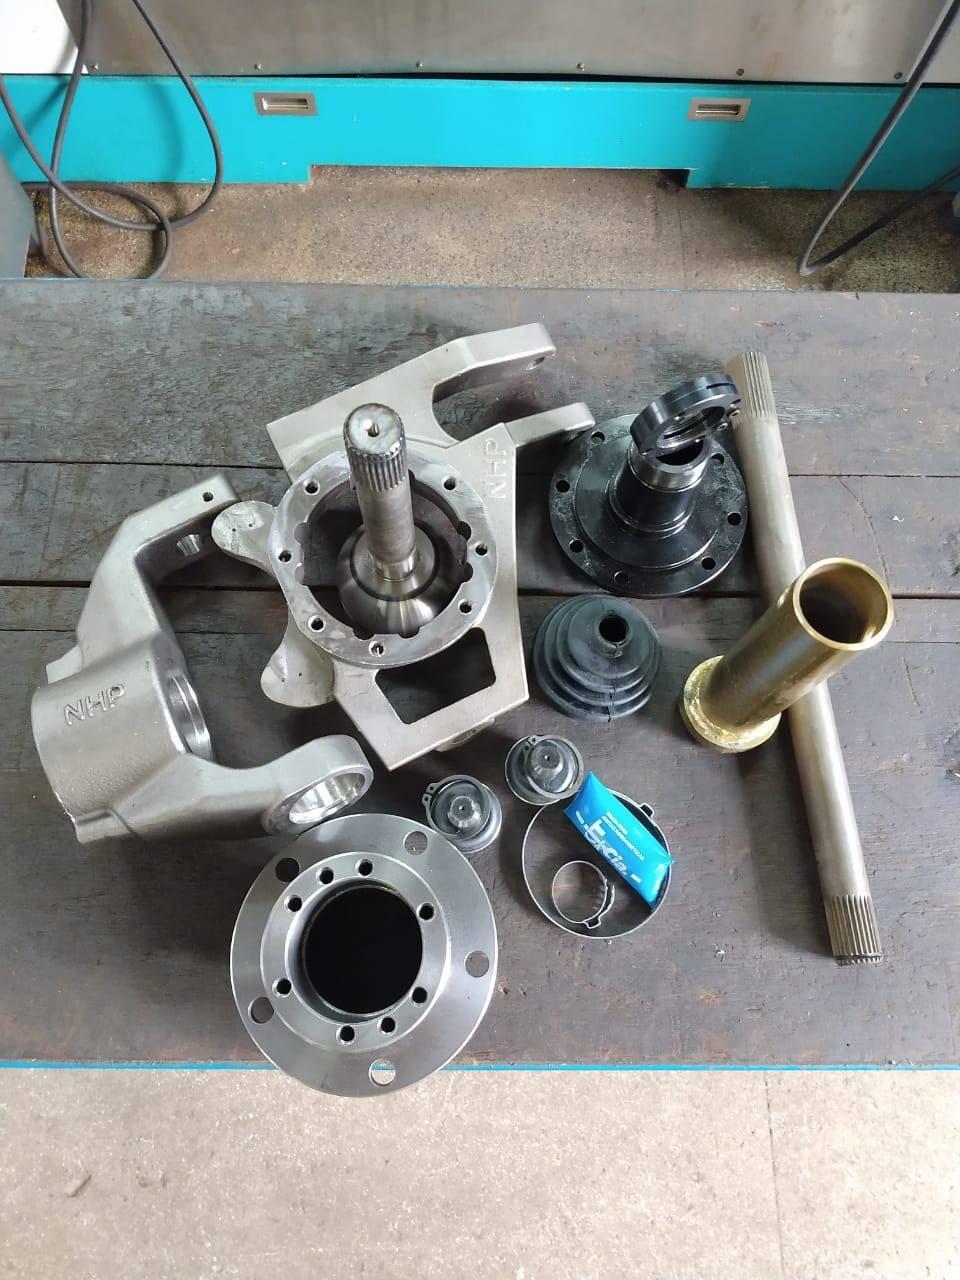 Munhão aberto NHP + kit rolamento Ducato - D driver equipamentos off road Joinville sc